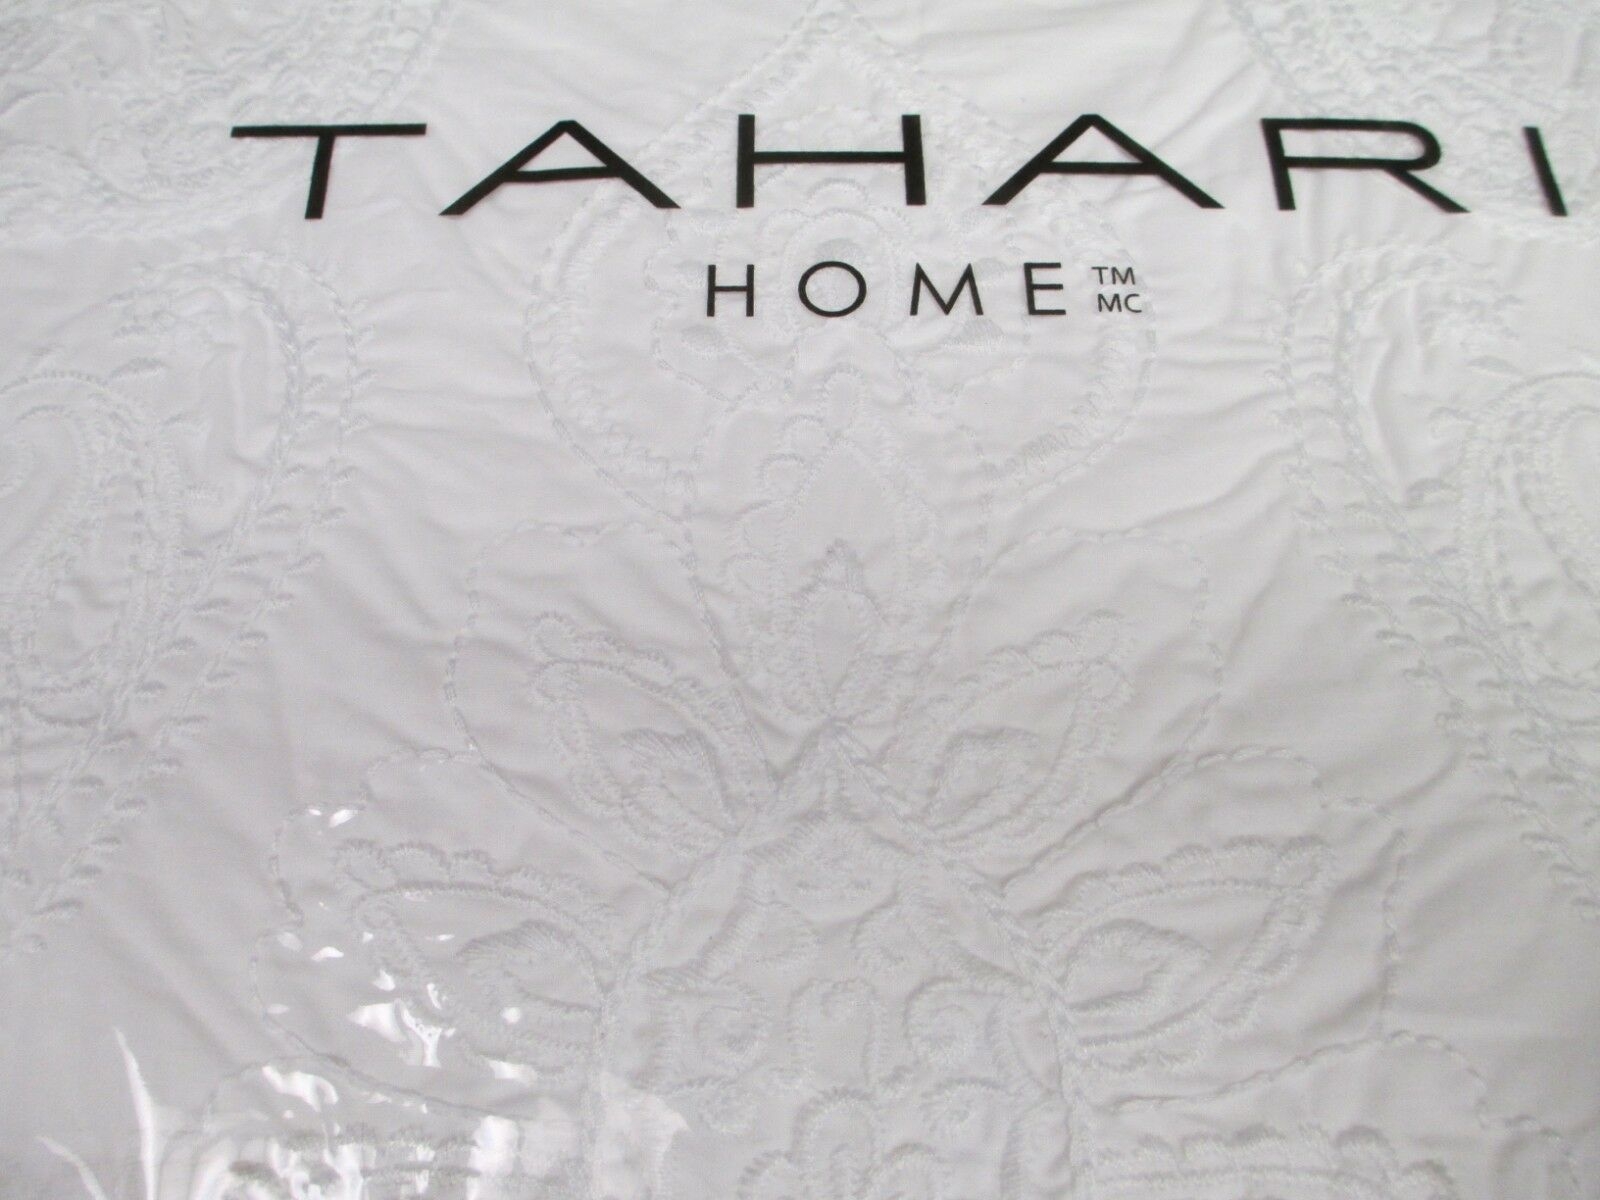 TAHARI 3pc bianca Embroiderosso Damask Floral Duvet Set - Full Queen